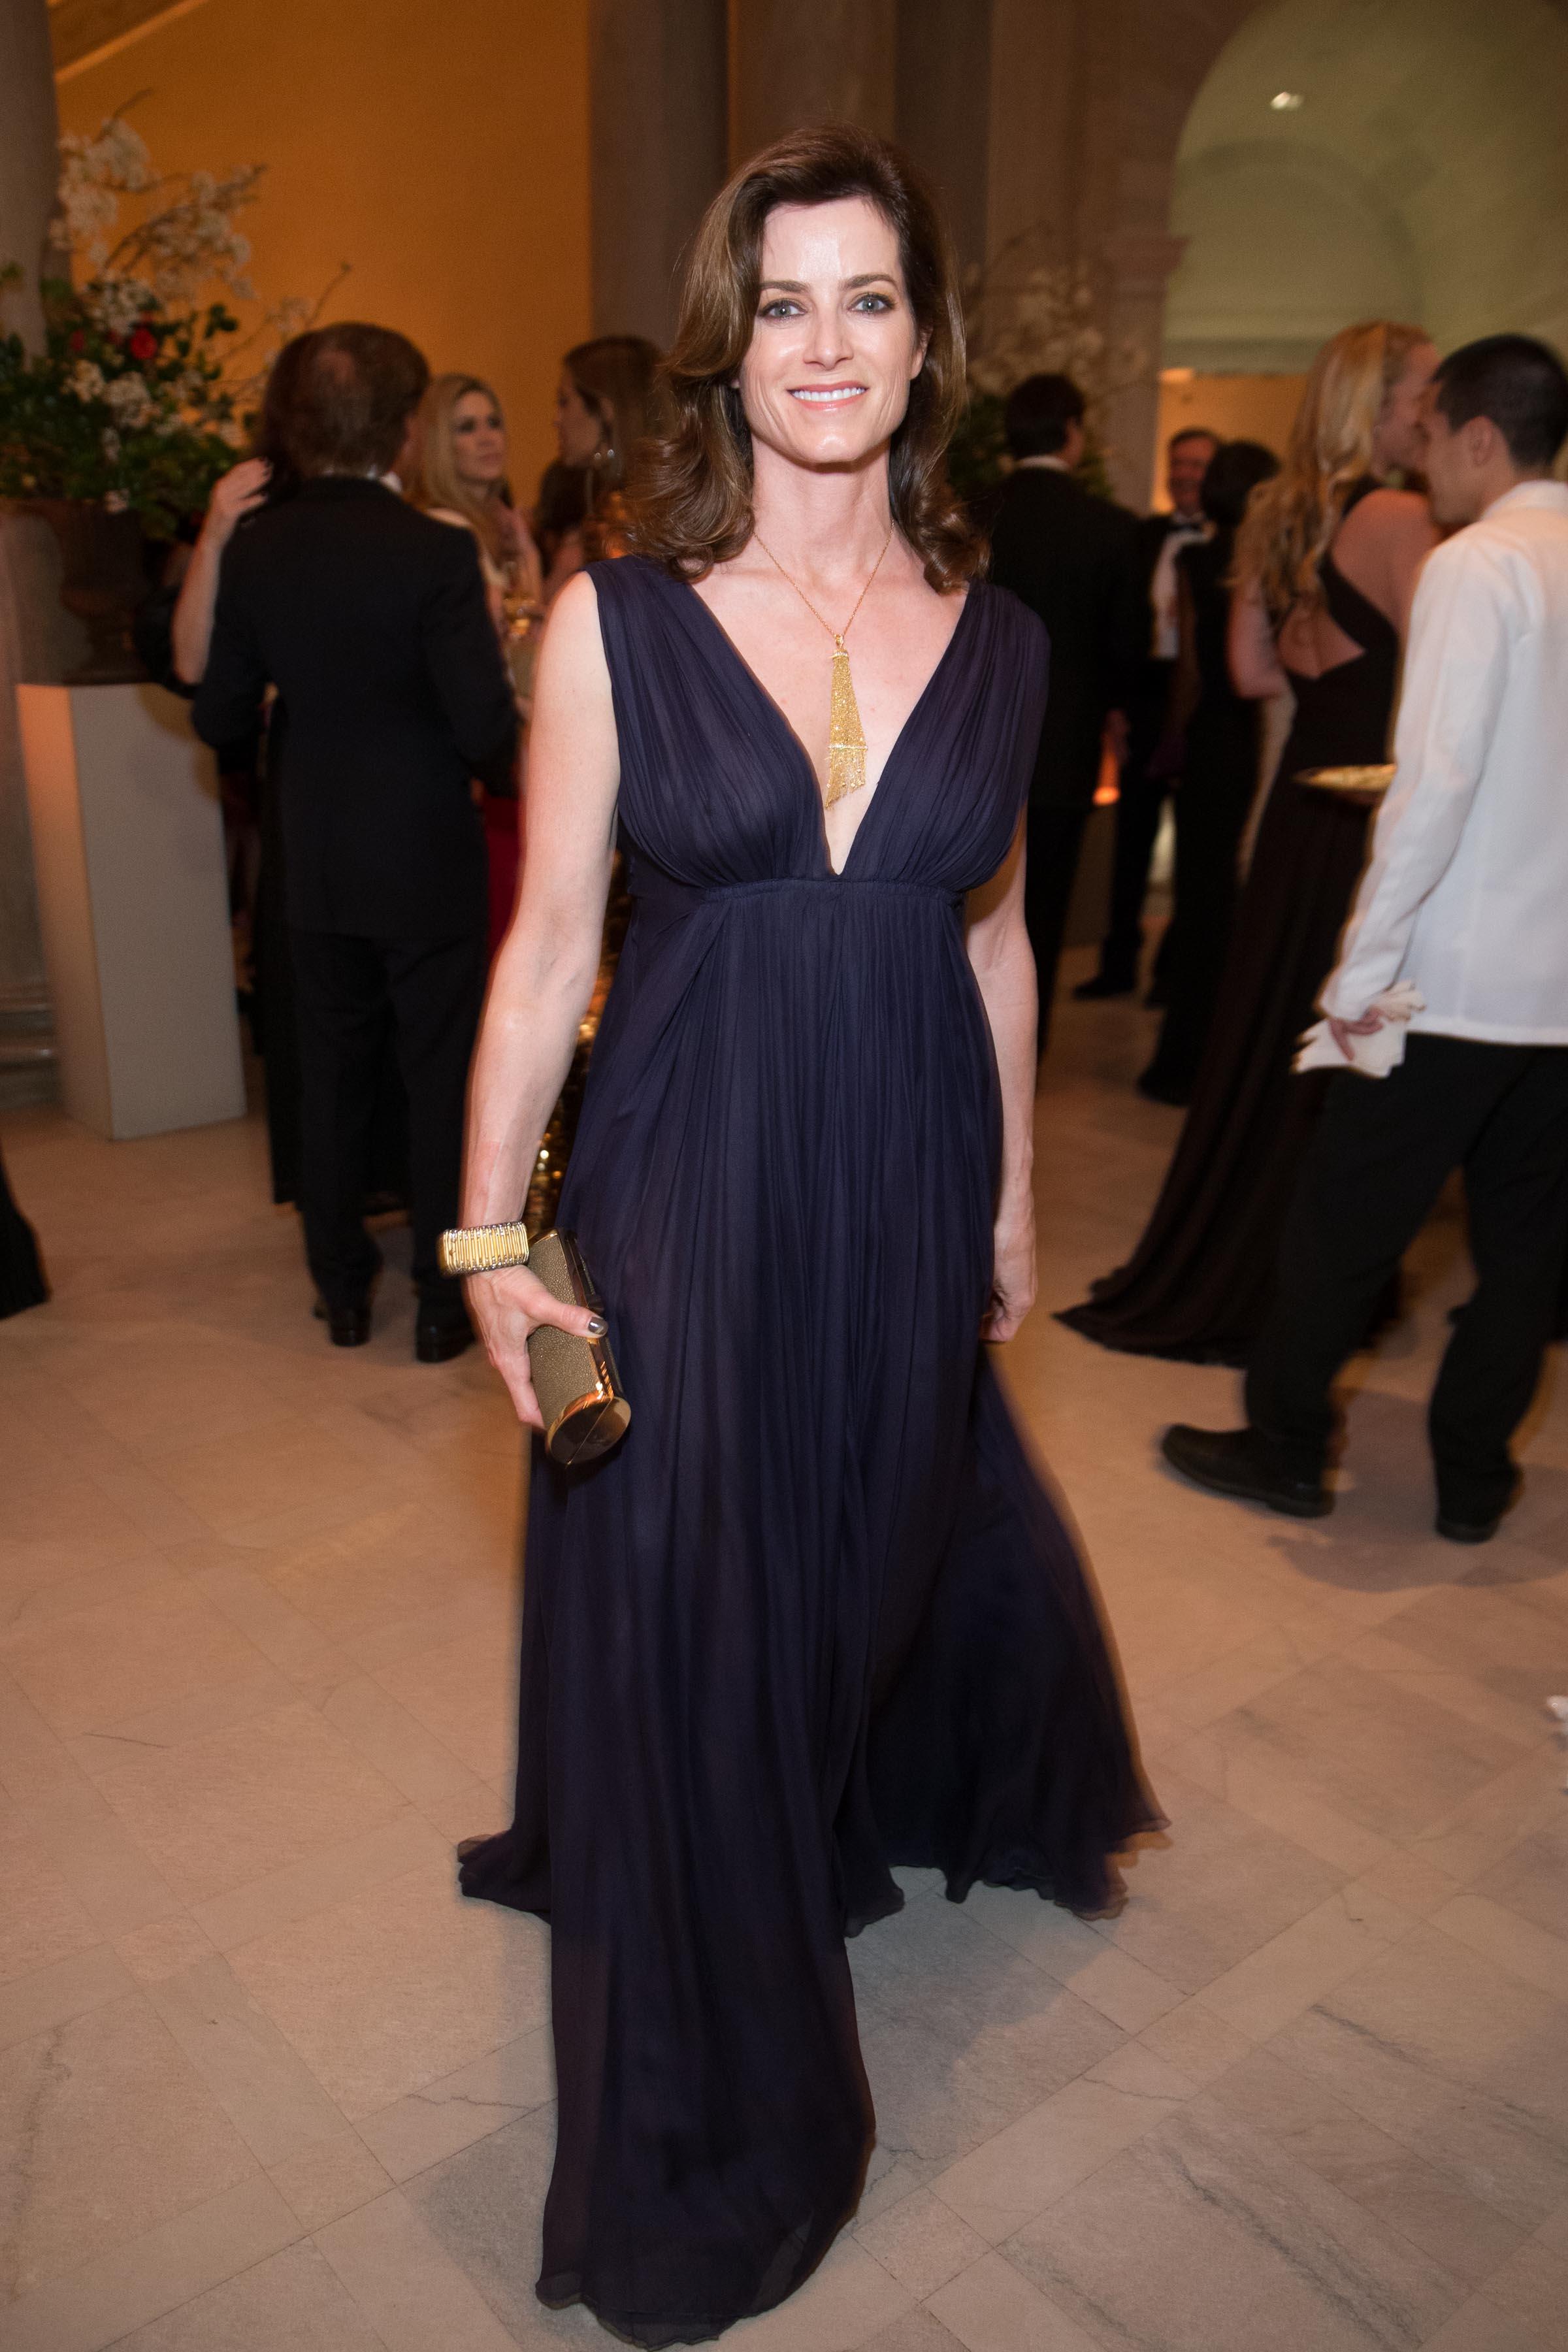 Carol Bonnieat the Salvatore Ferragamo 2014 Mid-Winter gala to benefit the Fine Arts Museums, San Francisco, wearing Salvatore Ferragamo